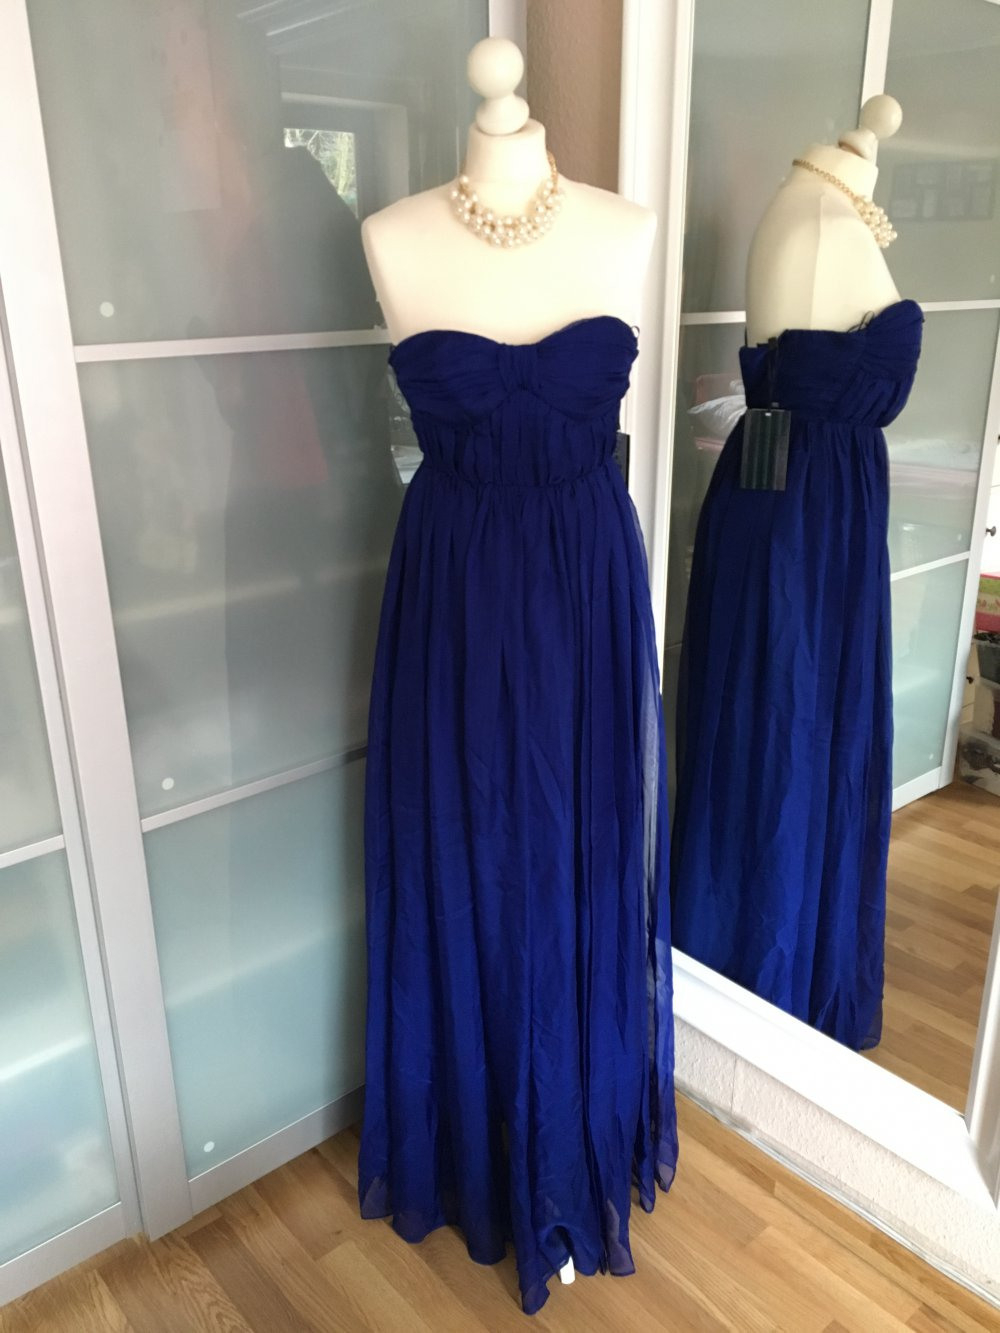 Leicht Abendkleid Royalblau VertriebDesigner Großartig Abendkleid Royalblau Galerie